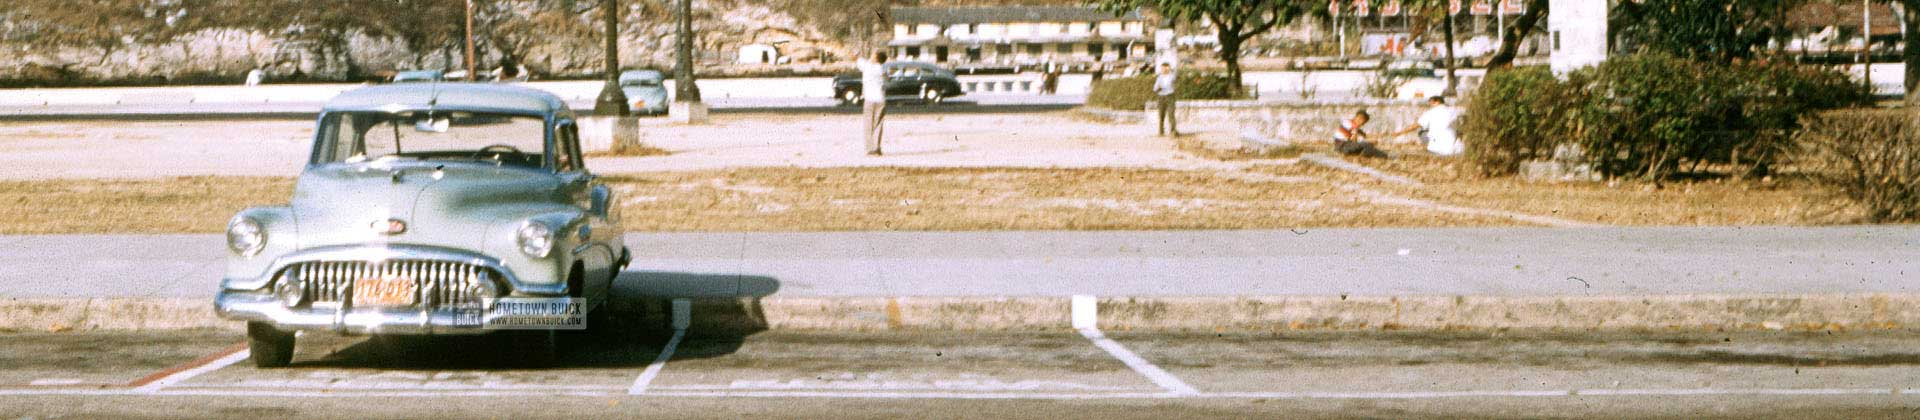 1952 Buick Slider